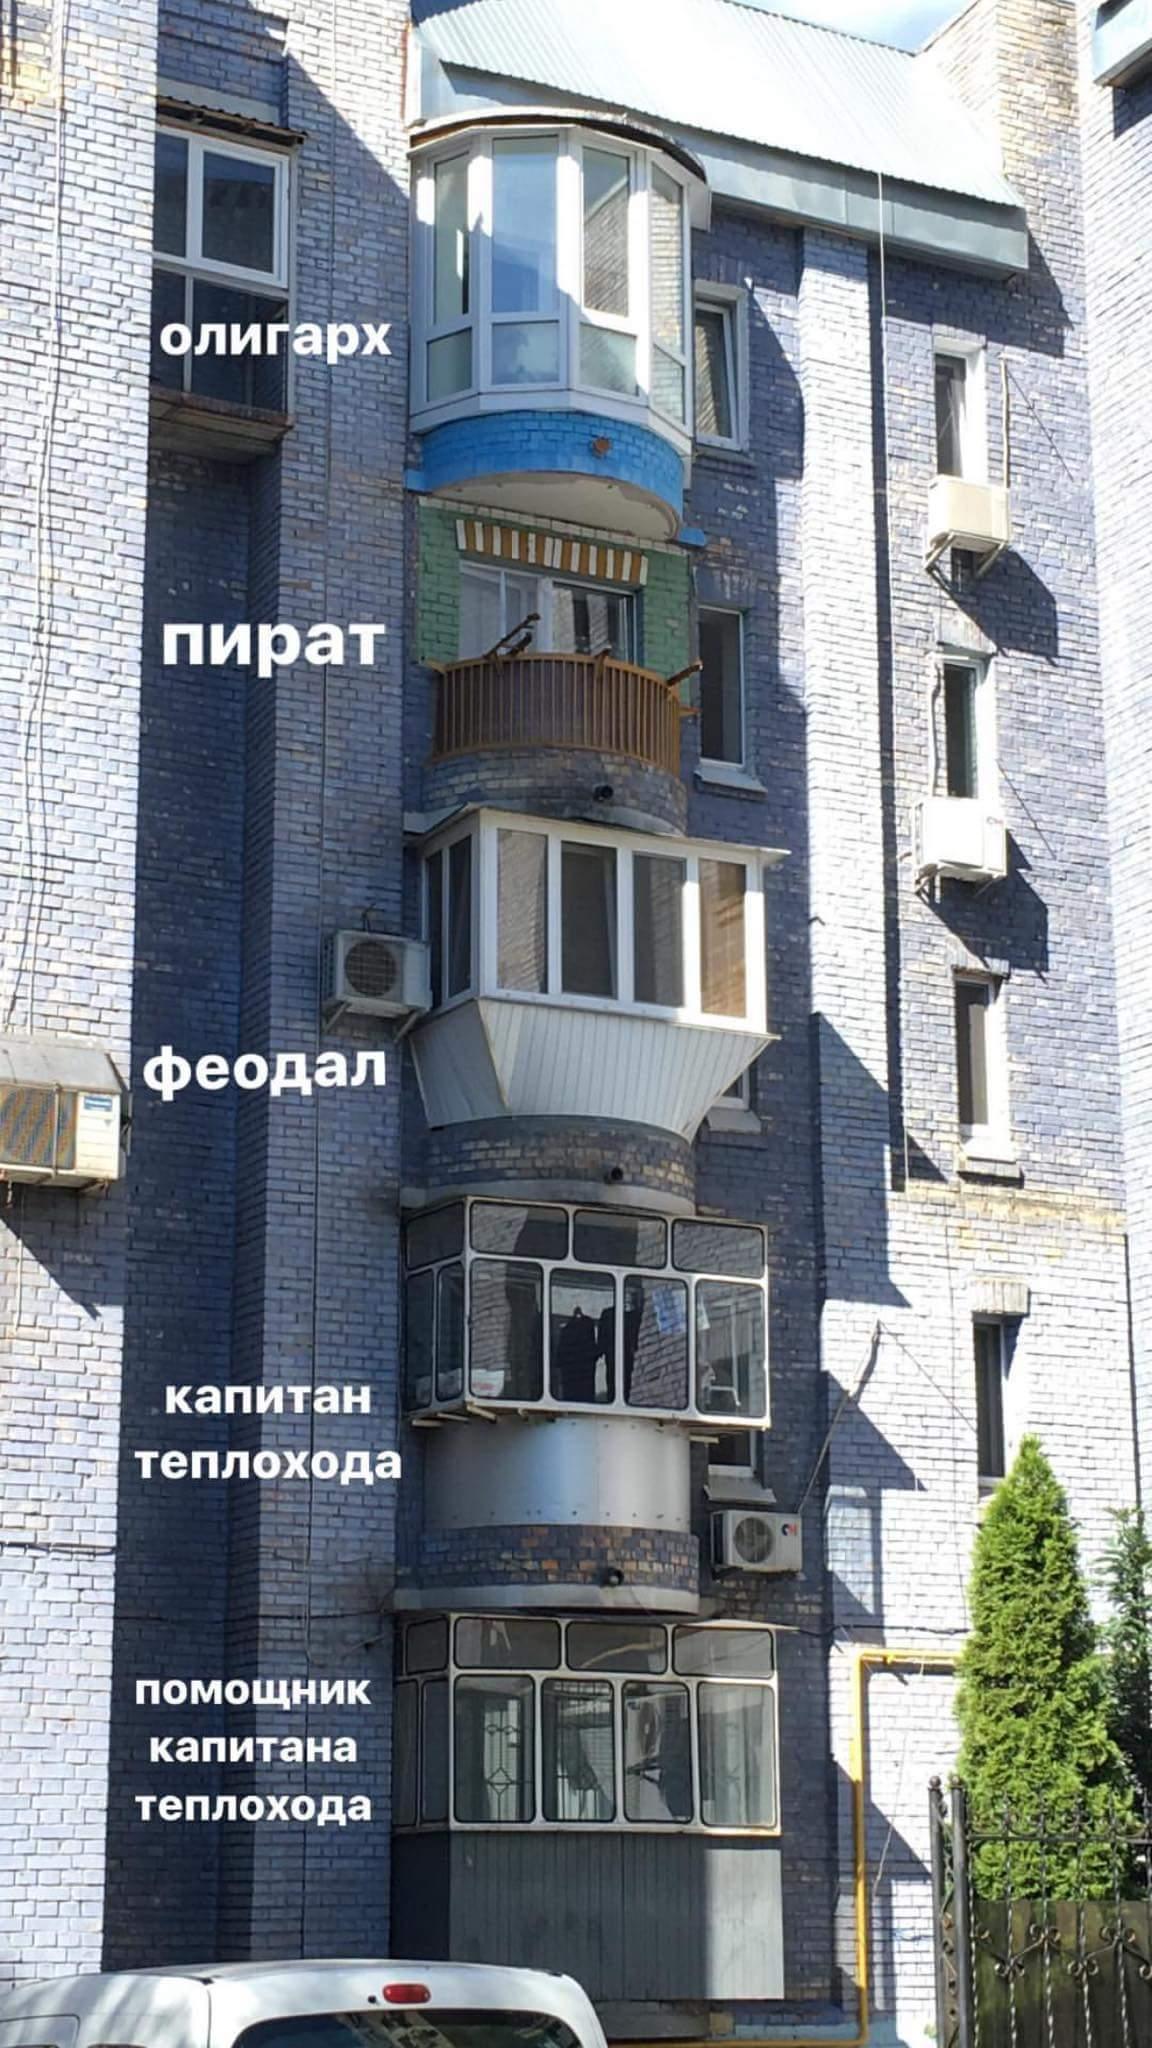 Щ олигарх пират феодал теплохода теплохода / балкон / смешны.